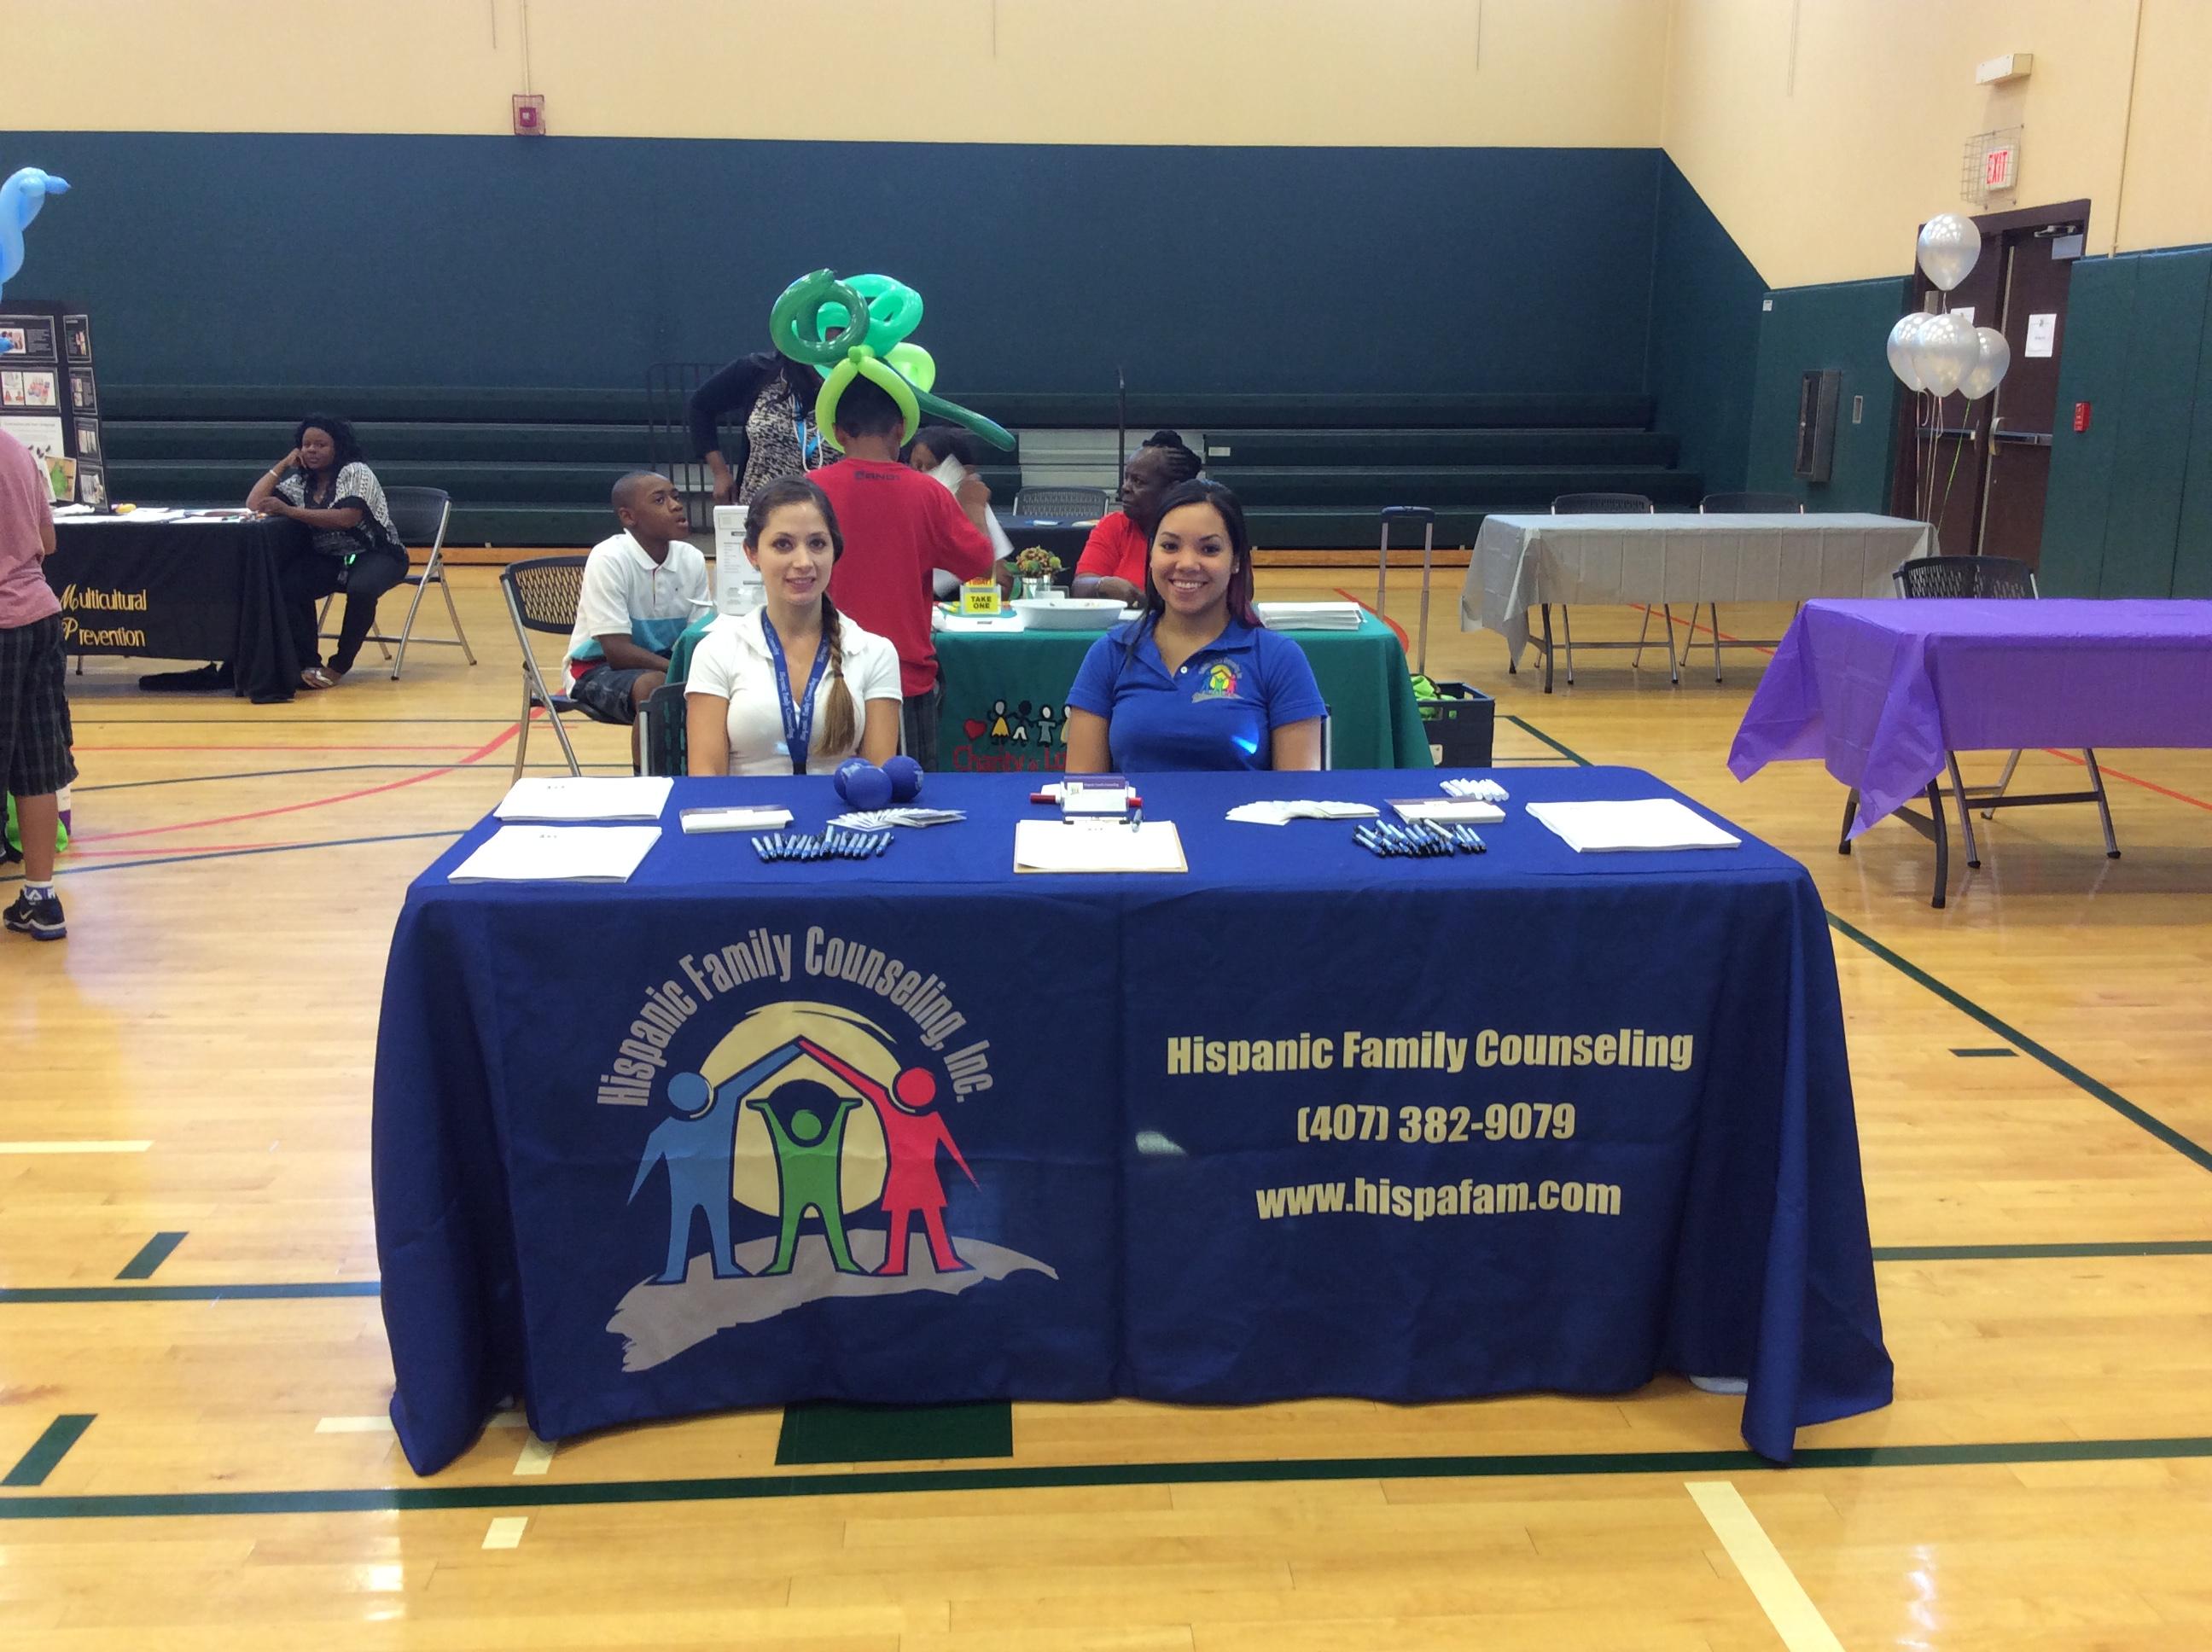 Hispanic Family Counseling